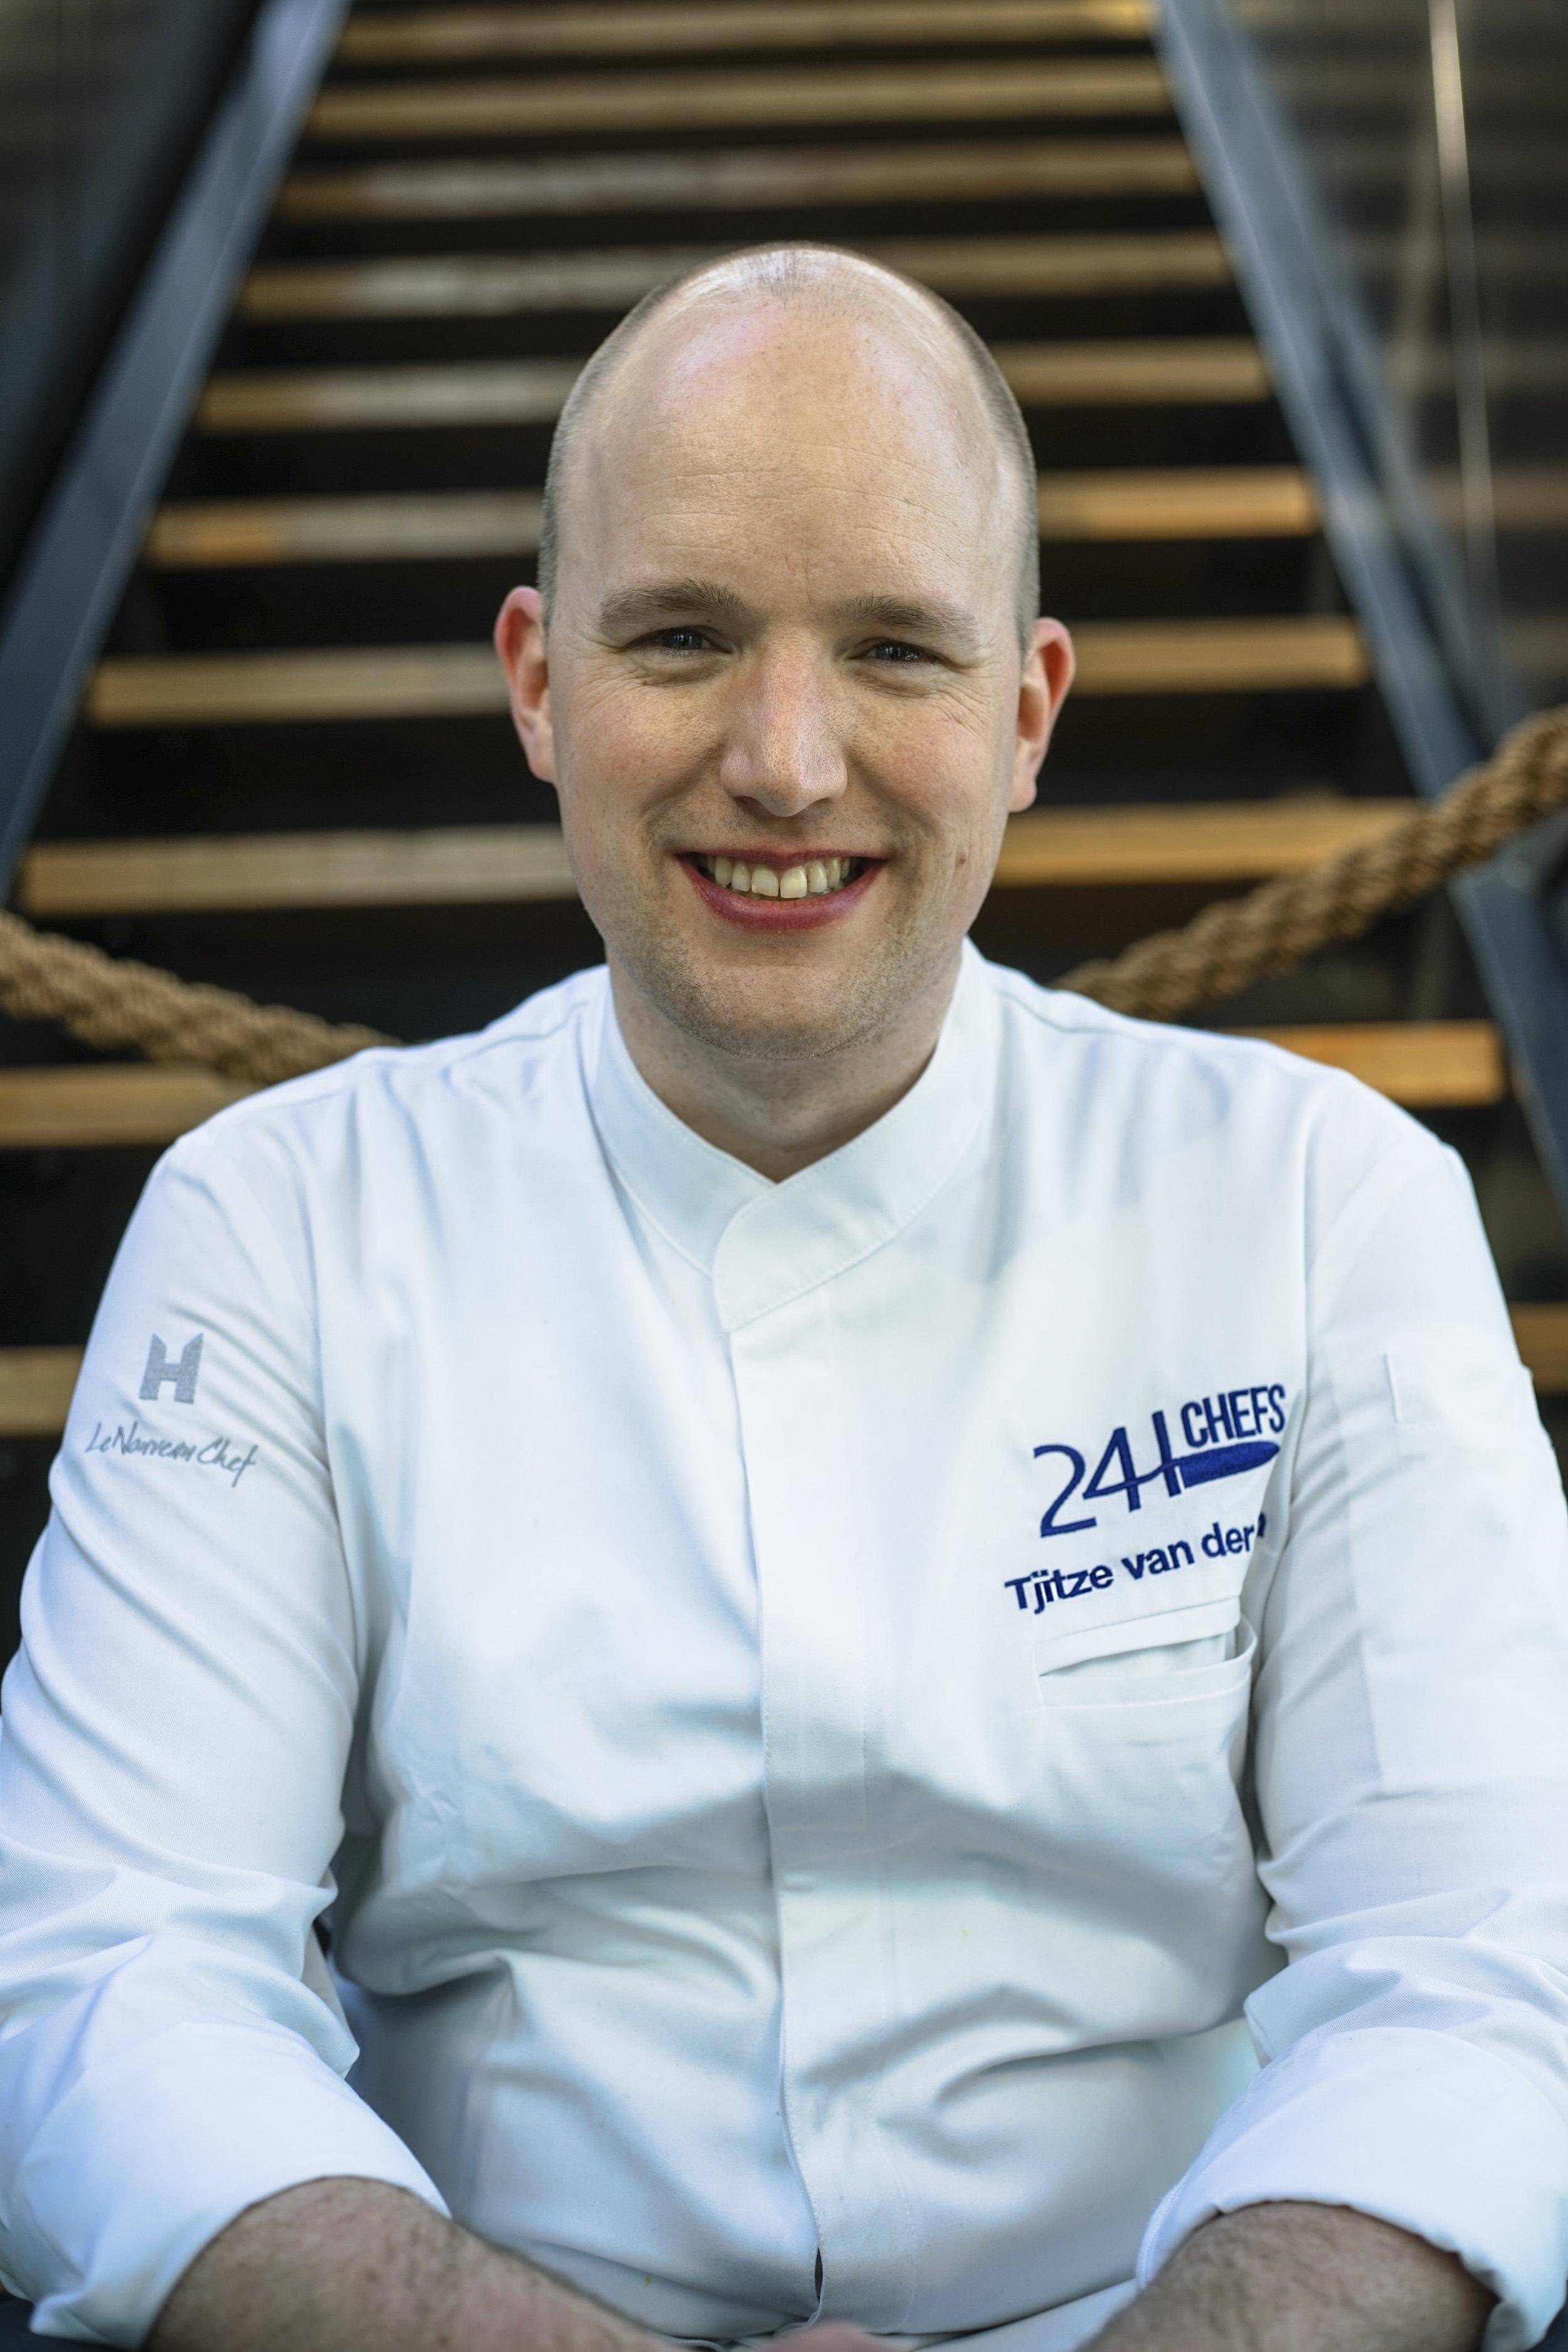 Chef Tjitze van der Dam (Lindsay Tammer).jpg